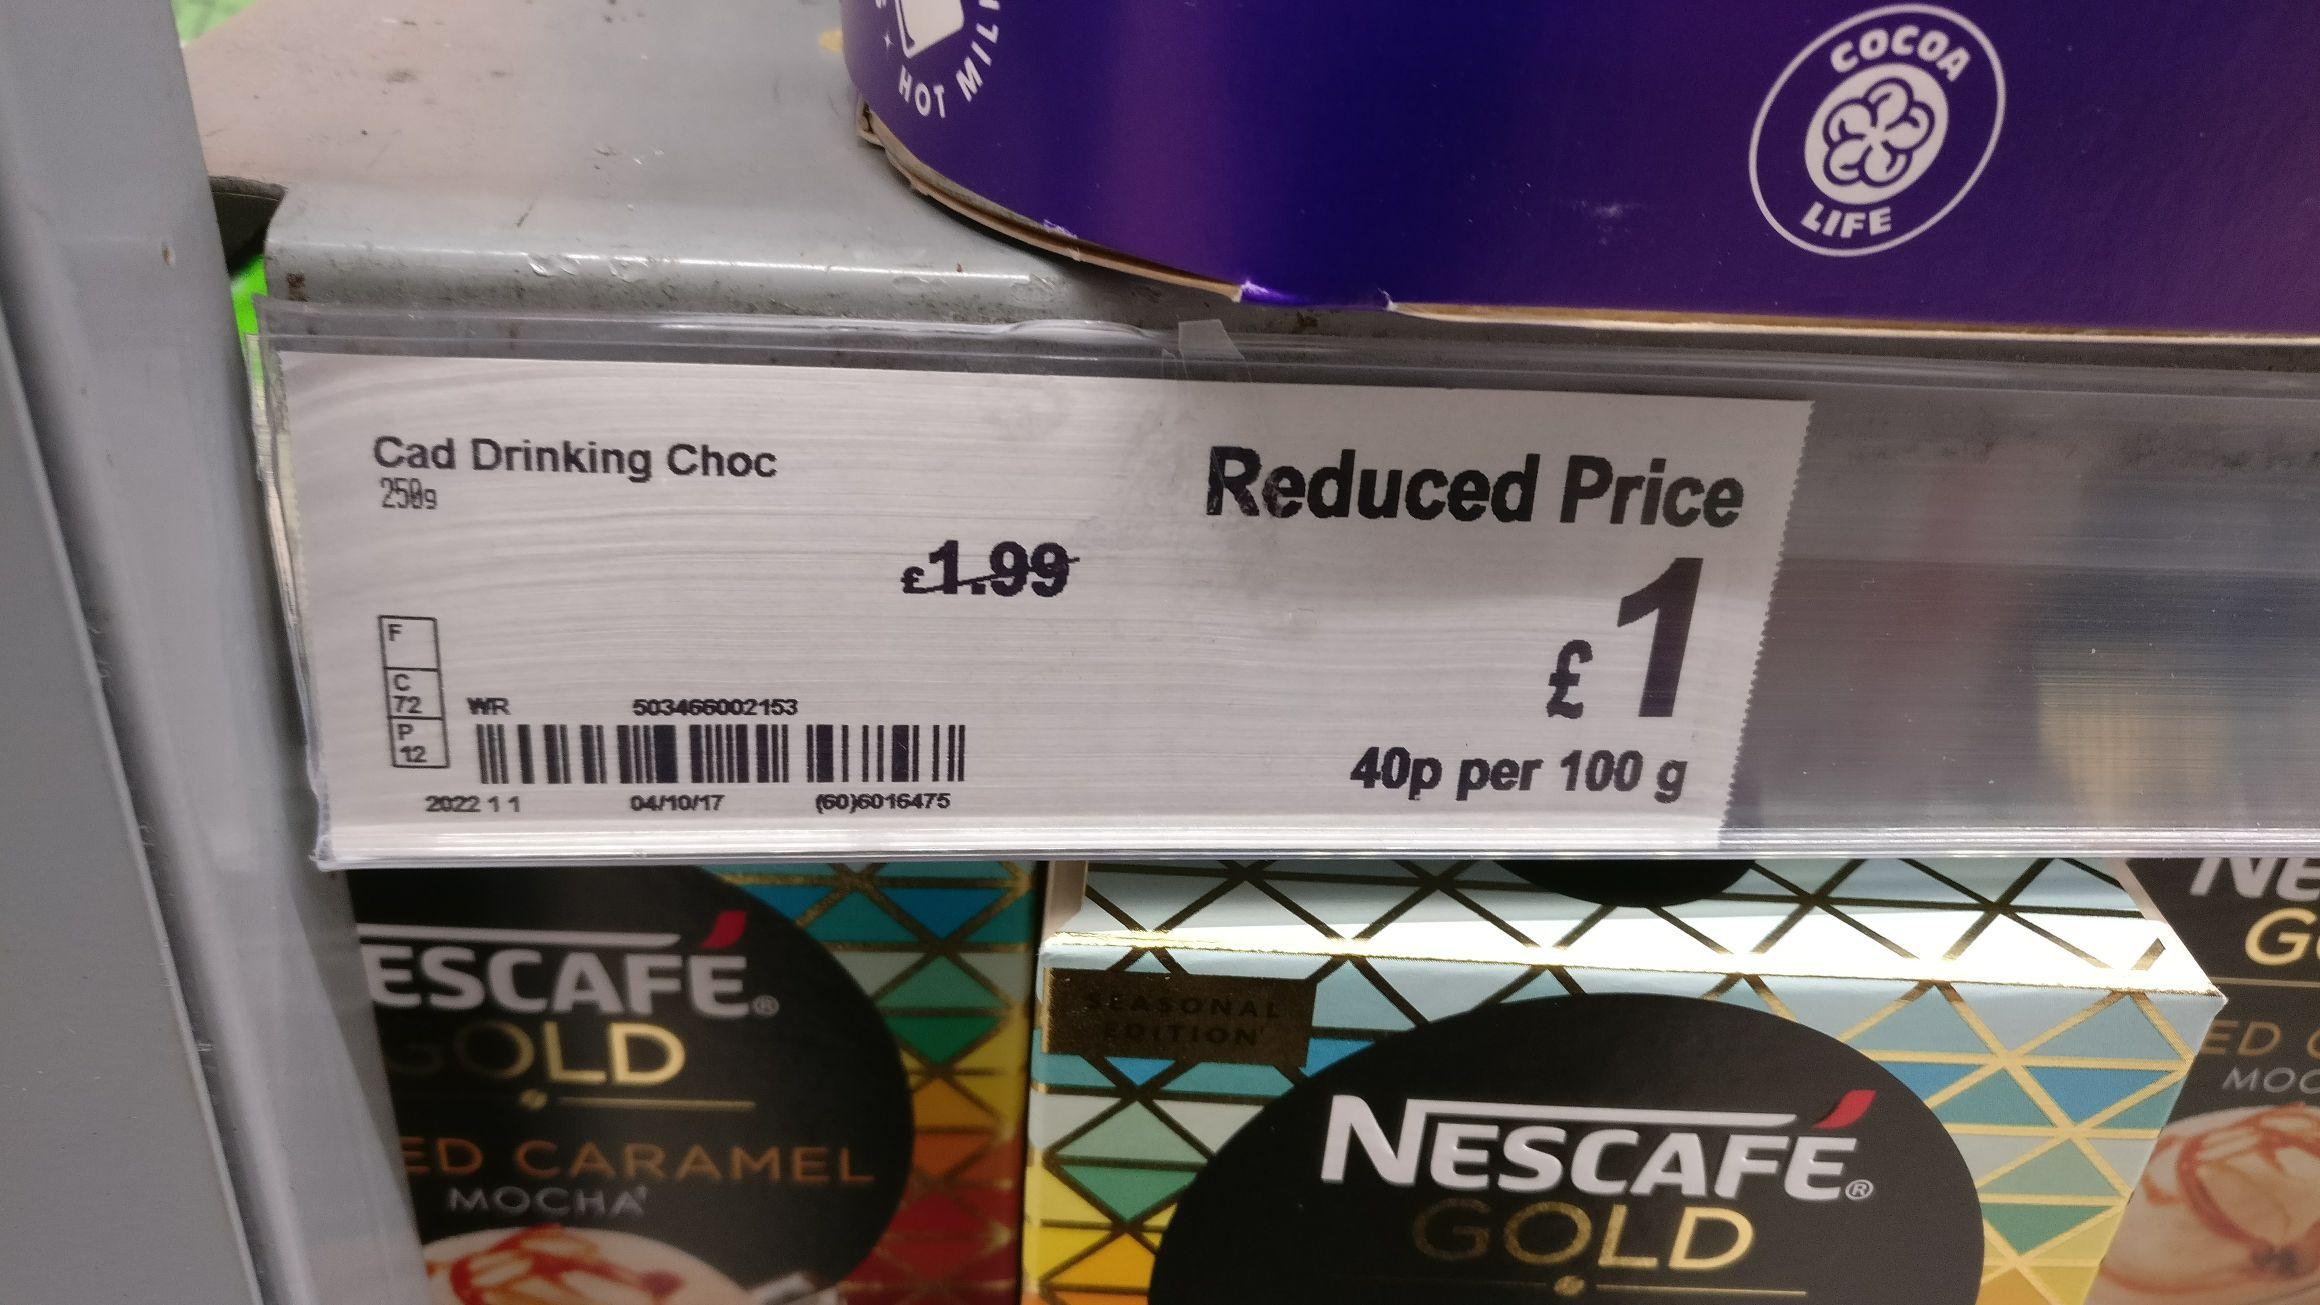 Cadbury hot chocolate powder 250g only £1 in Asda